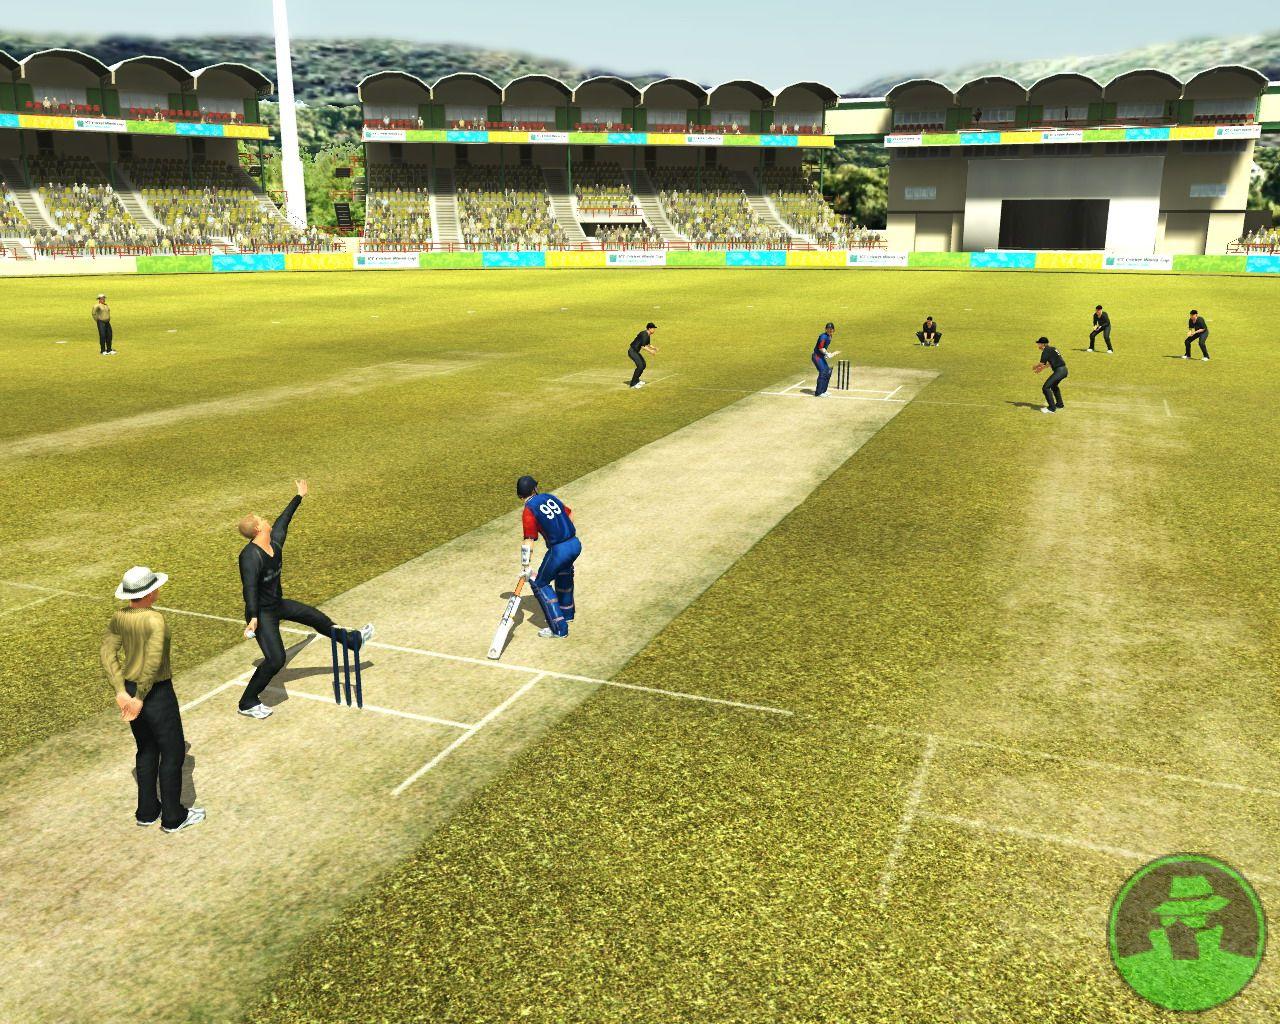 Brian Lara Cricket 2007 Game ~ Full Free Software Download